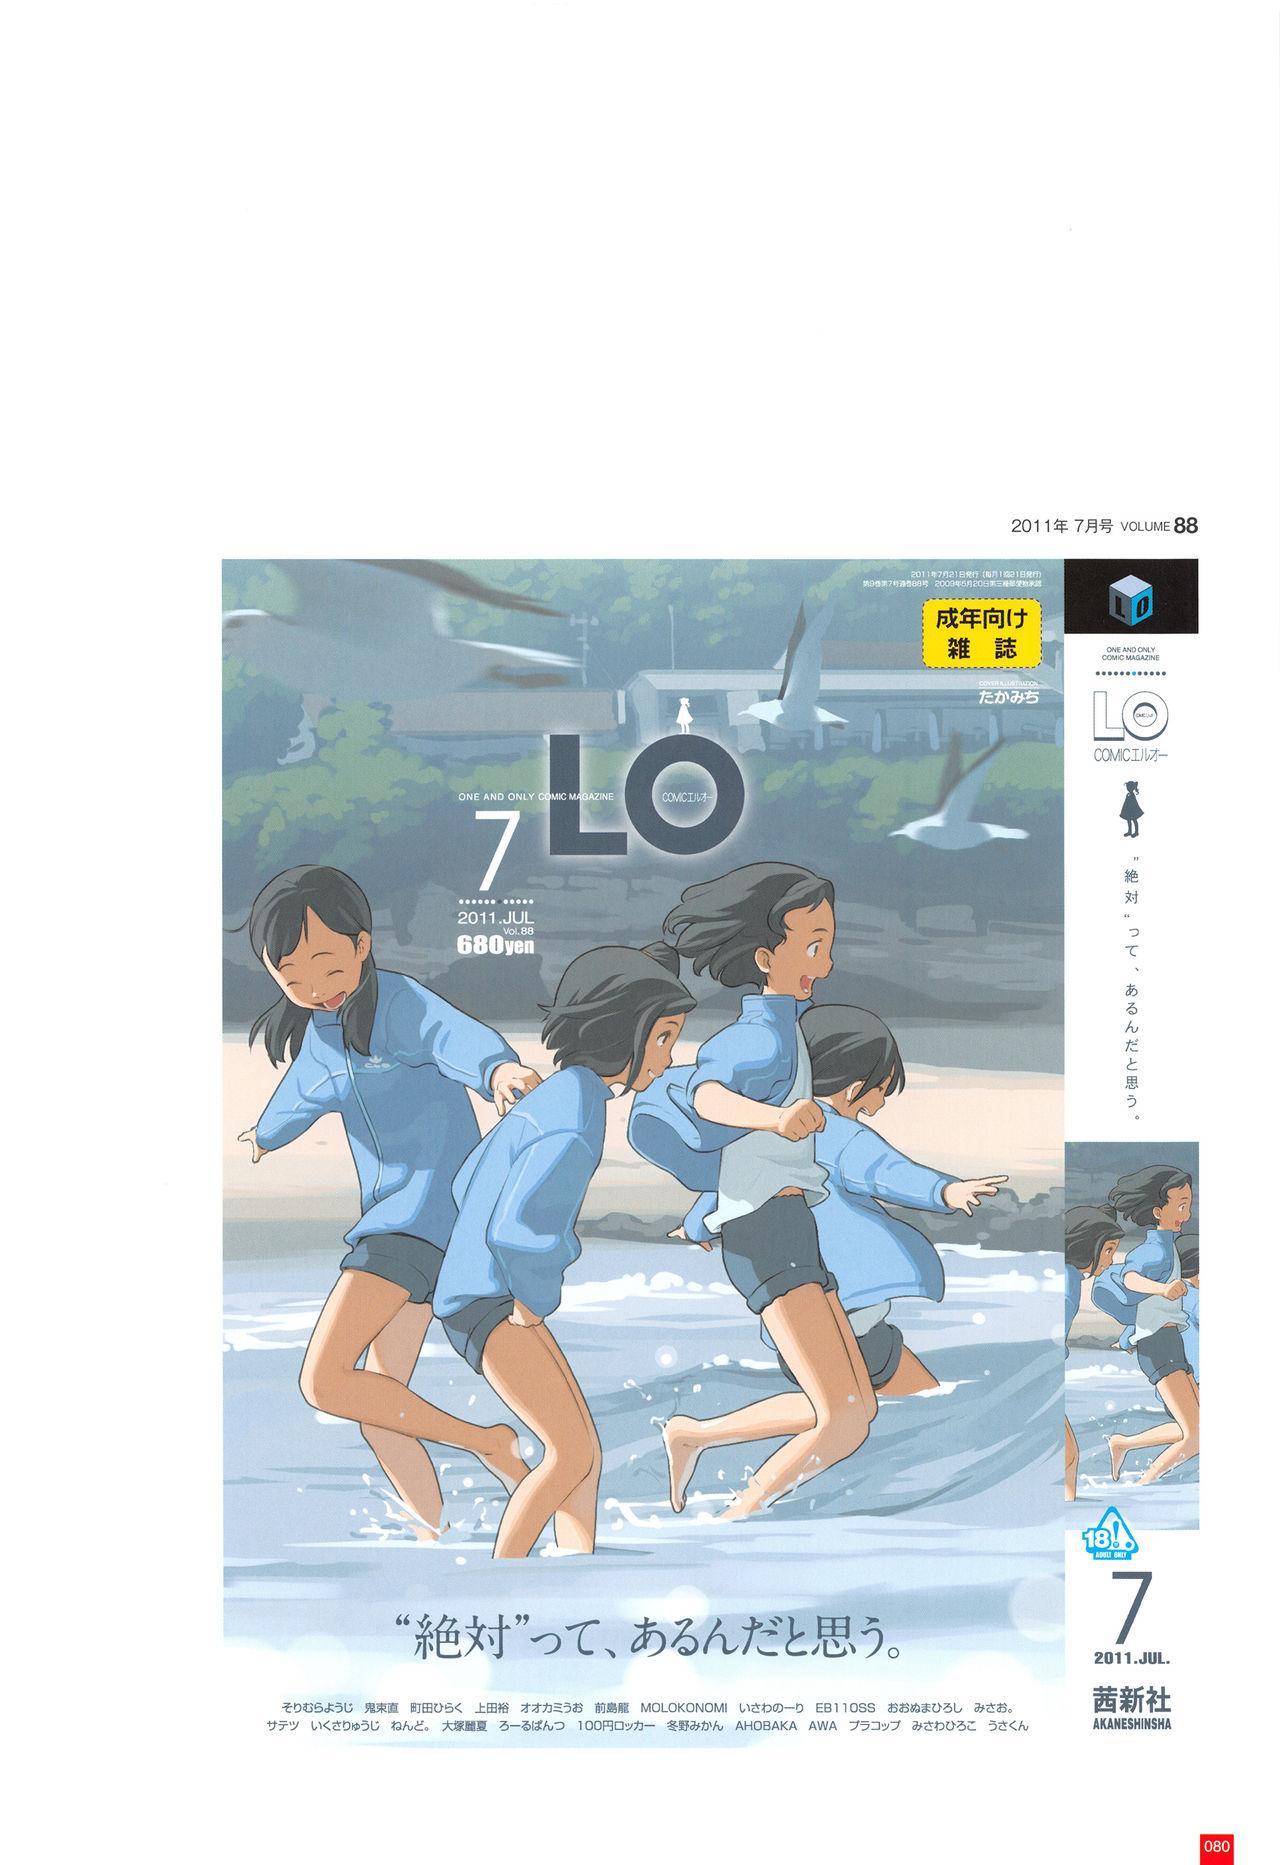 LO Artbook 2-A TAKAMICHI LOOP WORKS 82